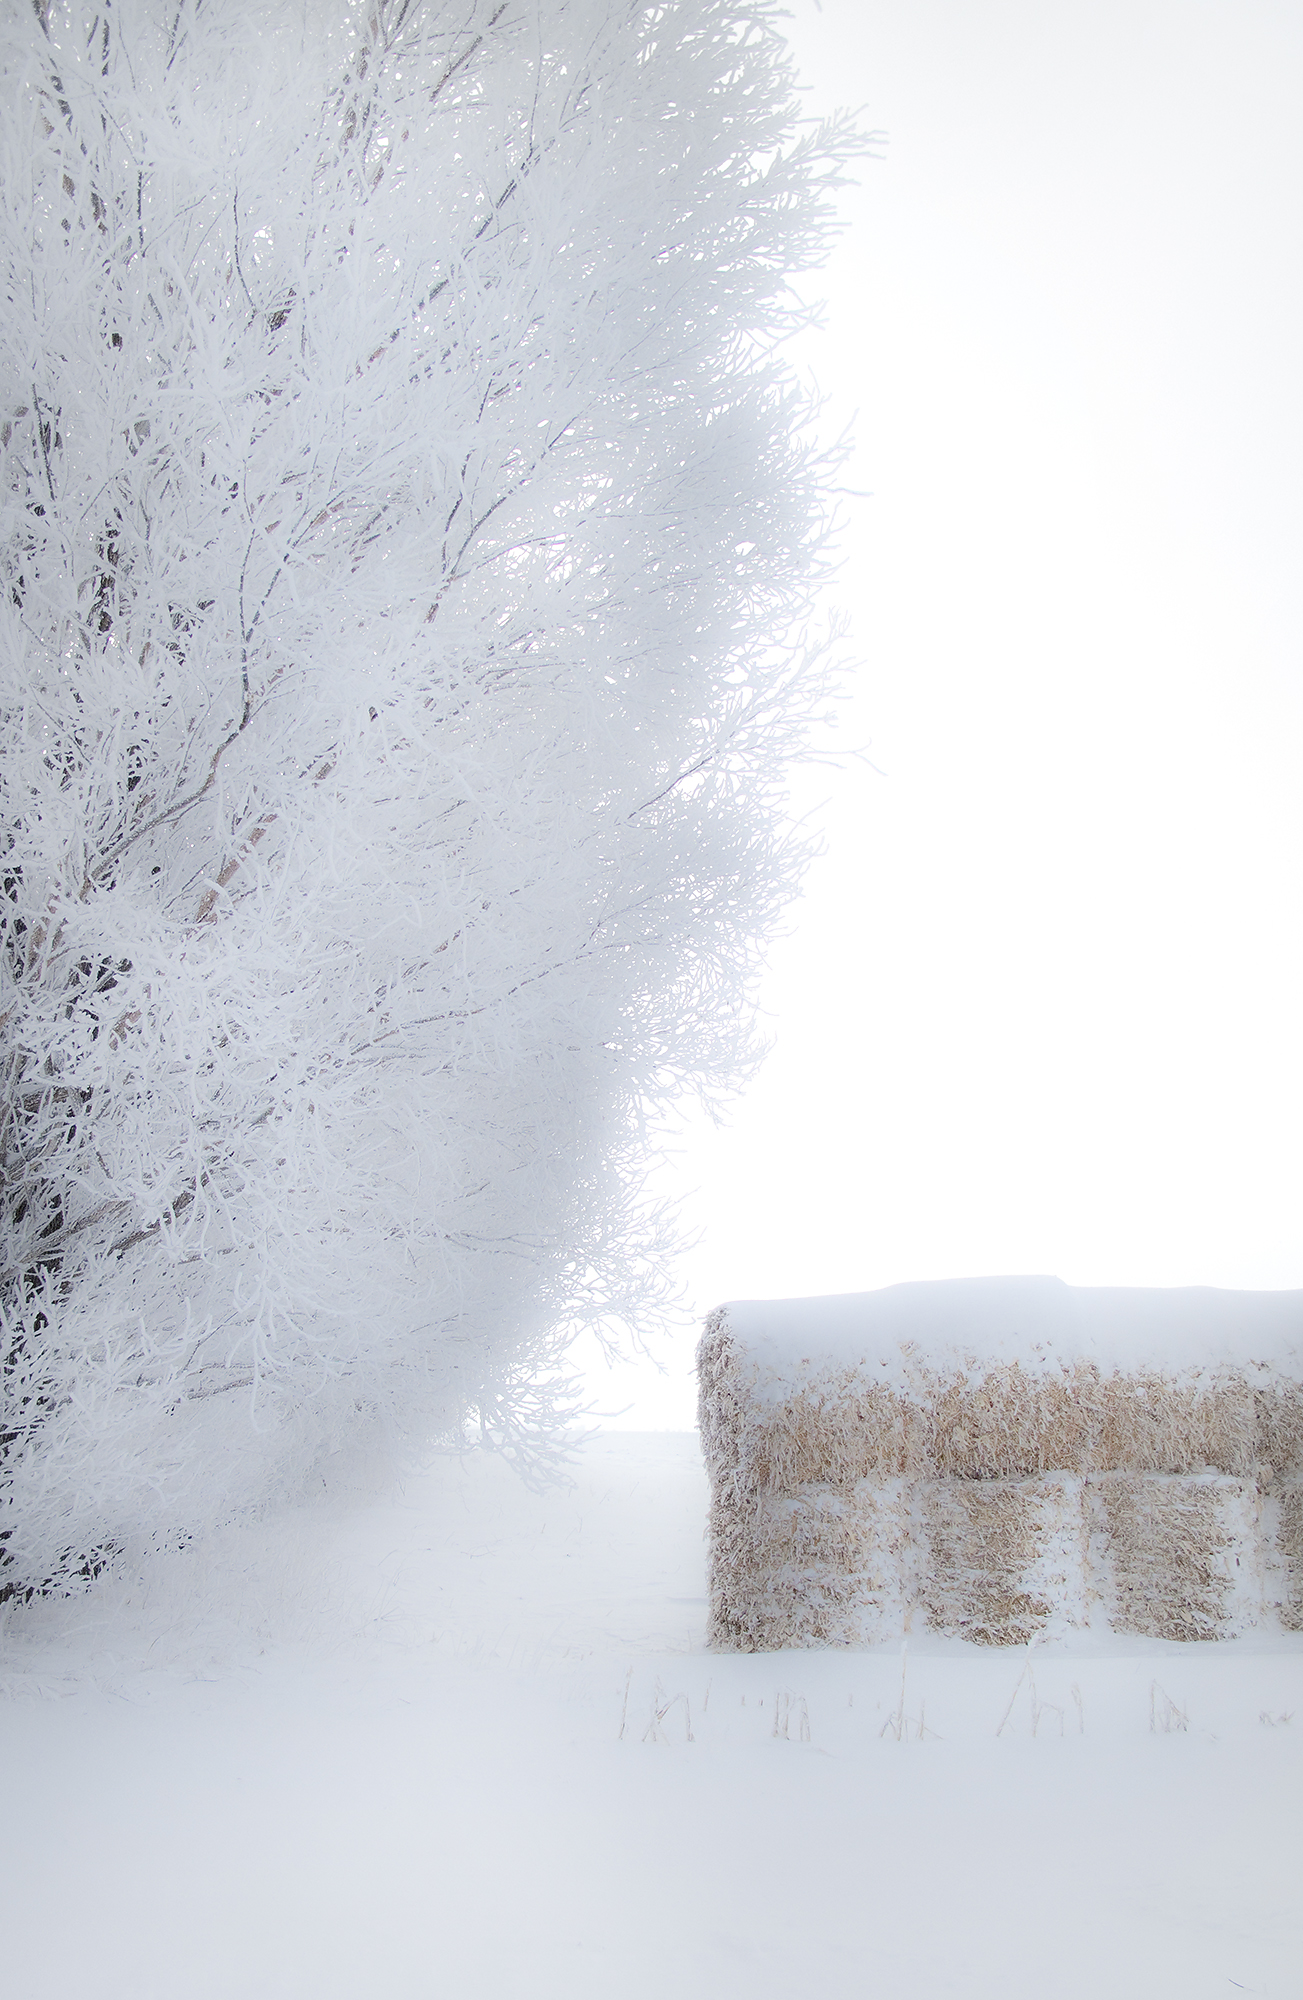 TreeStraw.jpg